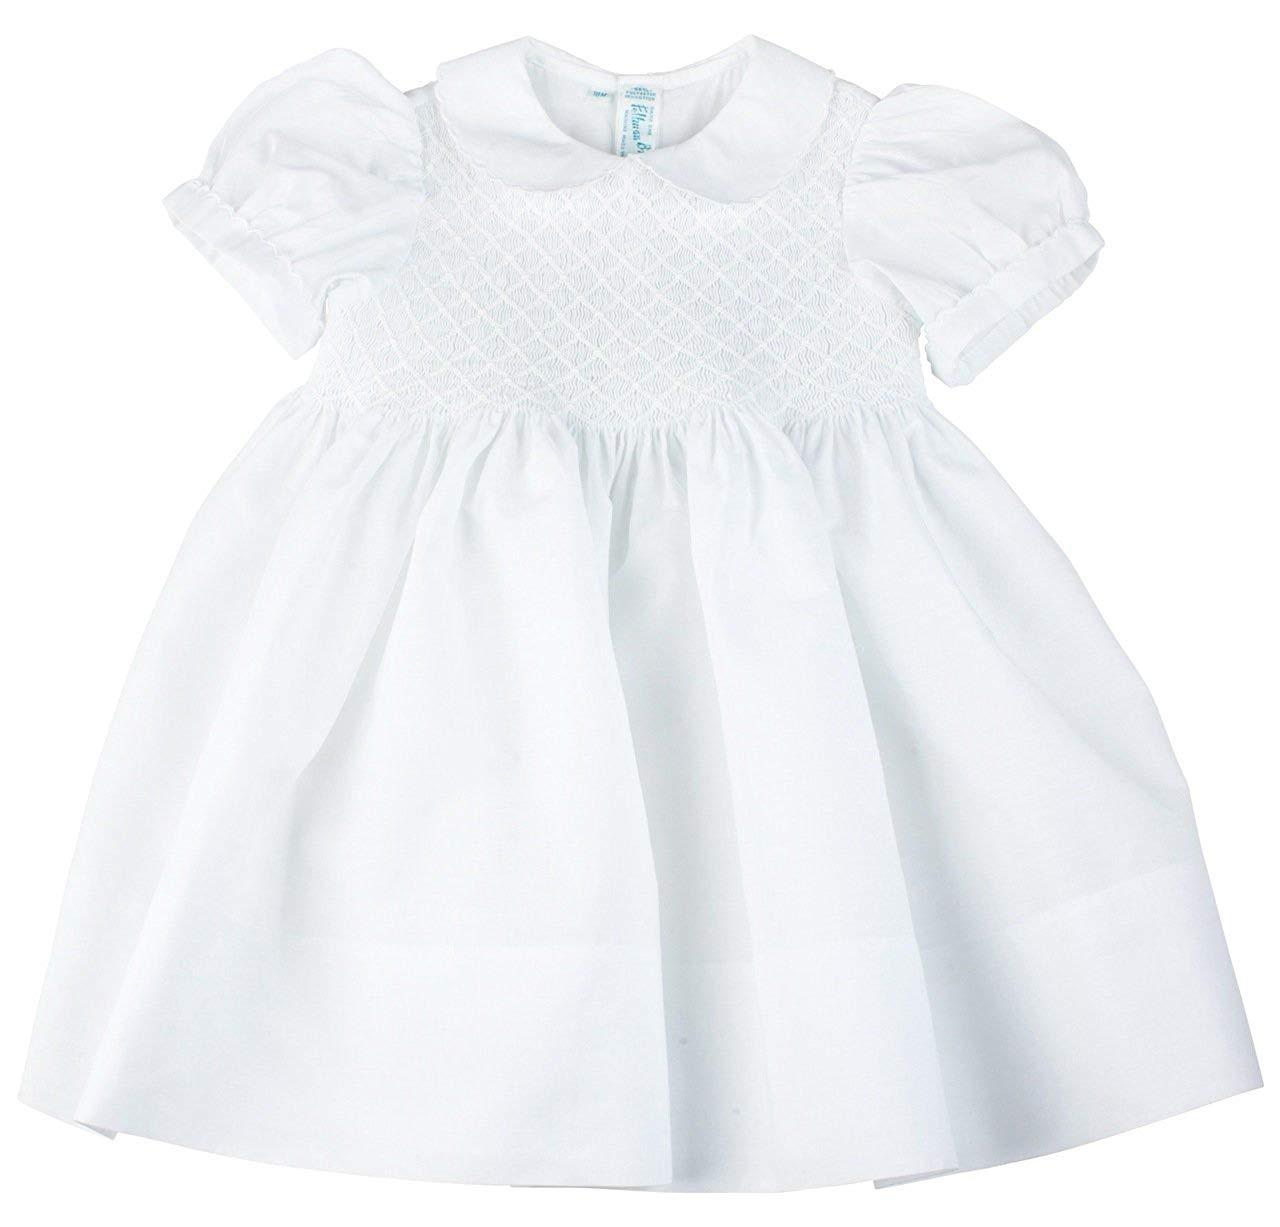 ecb4edd4b4c Get Quotations · Feltman Brothers Girls White Smocked Dress Infant   Toddler